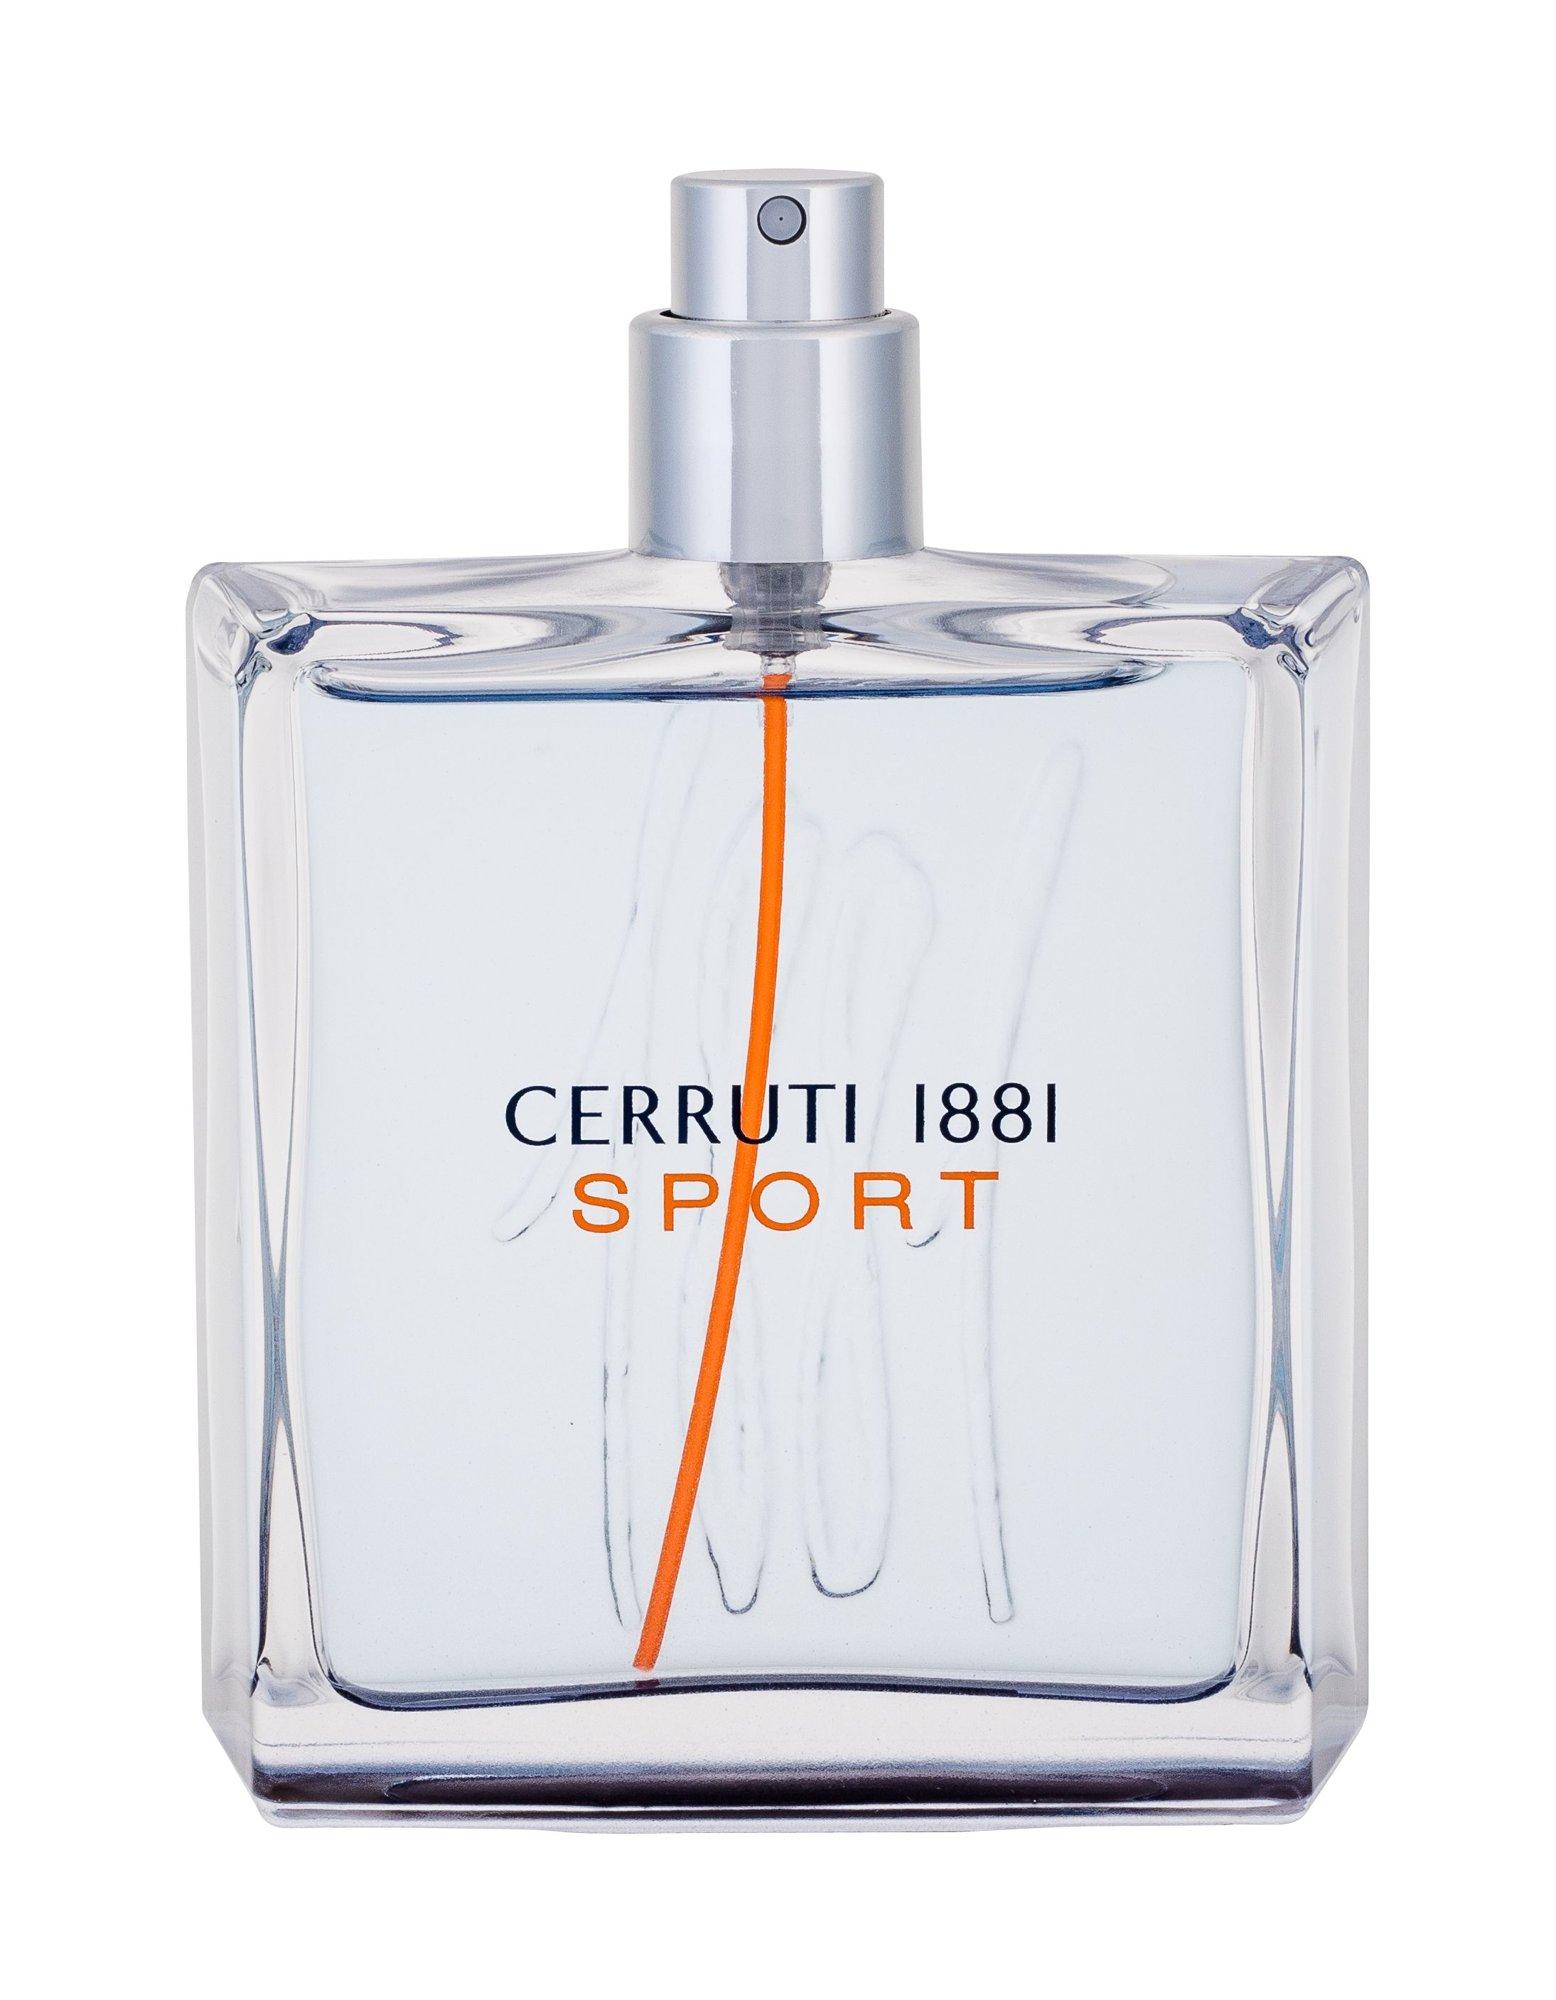 Nino Cerruti Cerruti 1881 Sport EDT 100ml